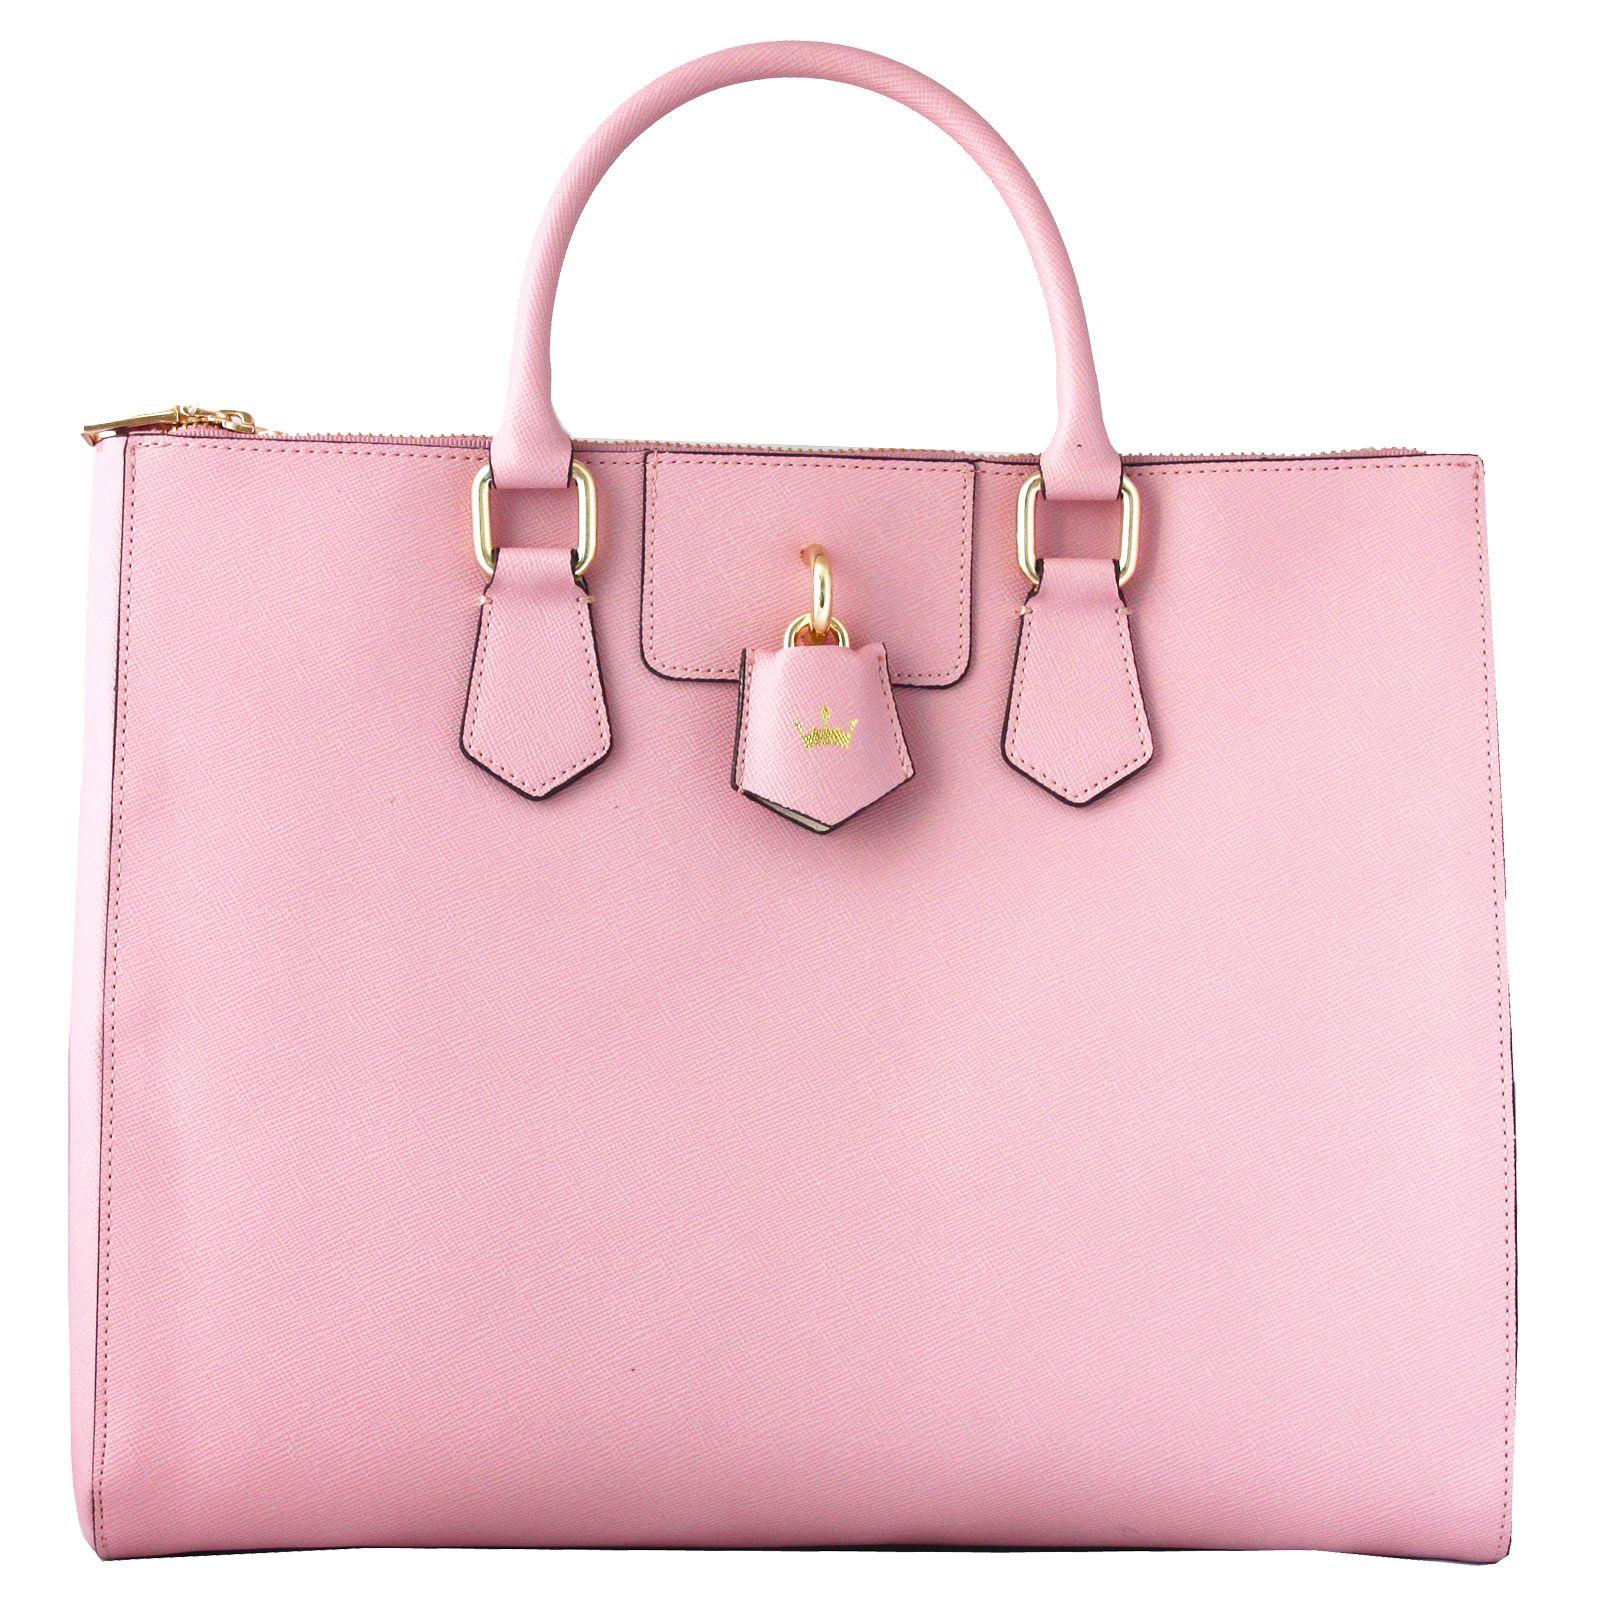 Luxury Leather big partician Classic Tote Handbag $69.99   http://porstyle.com http://www.amazon.com/gp/product/B00C5VYDHI